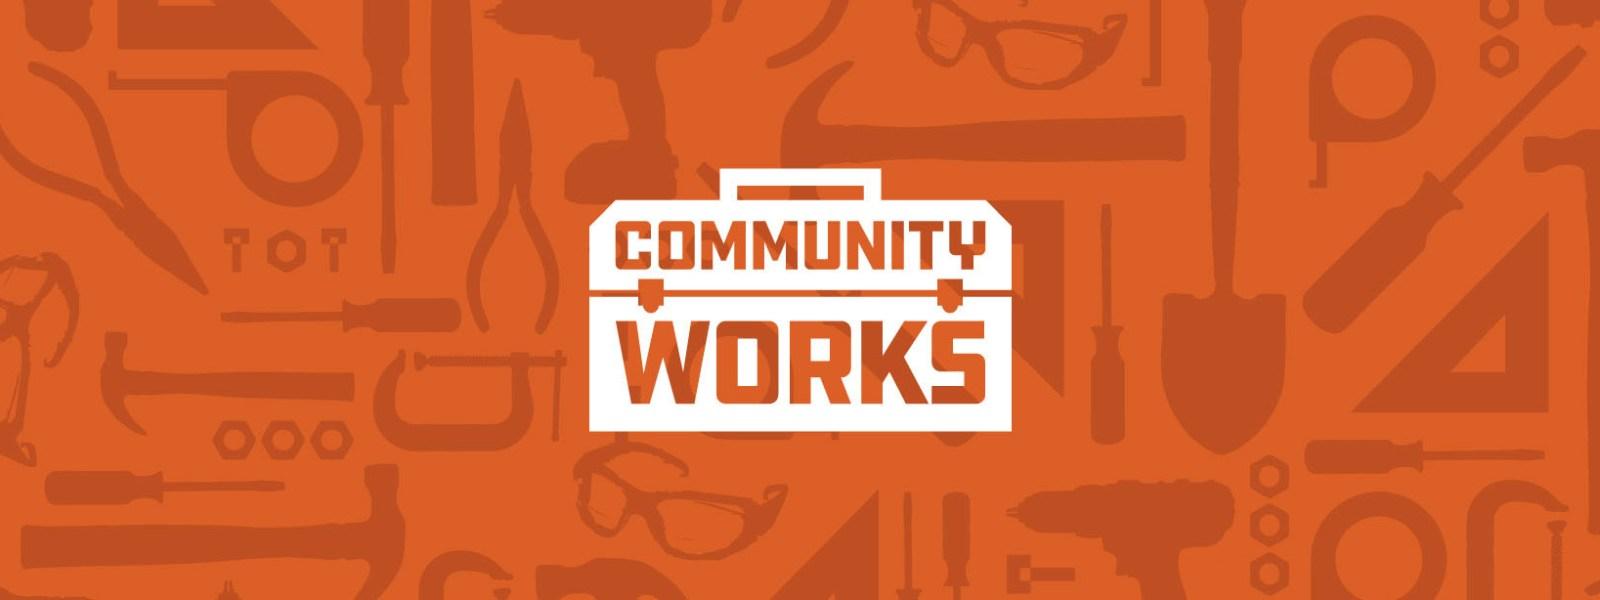 Community Works